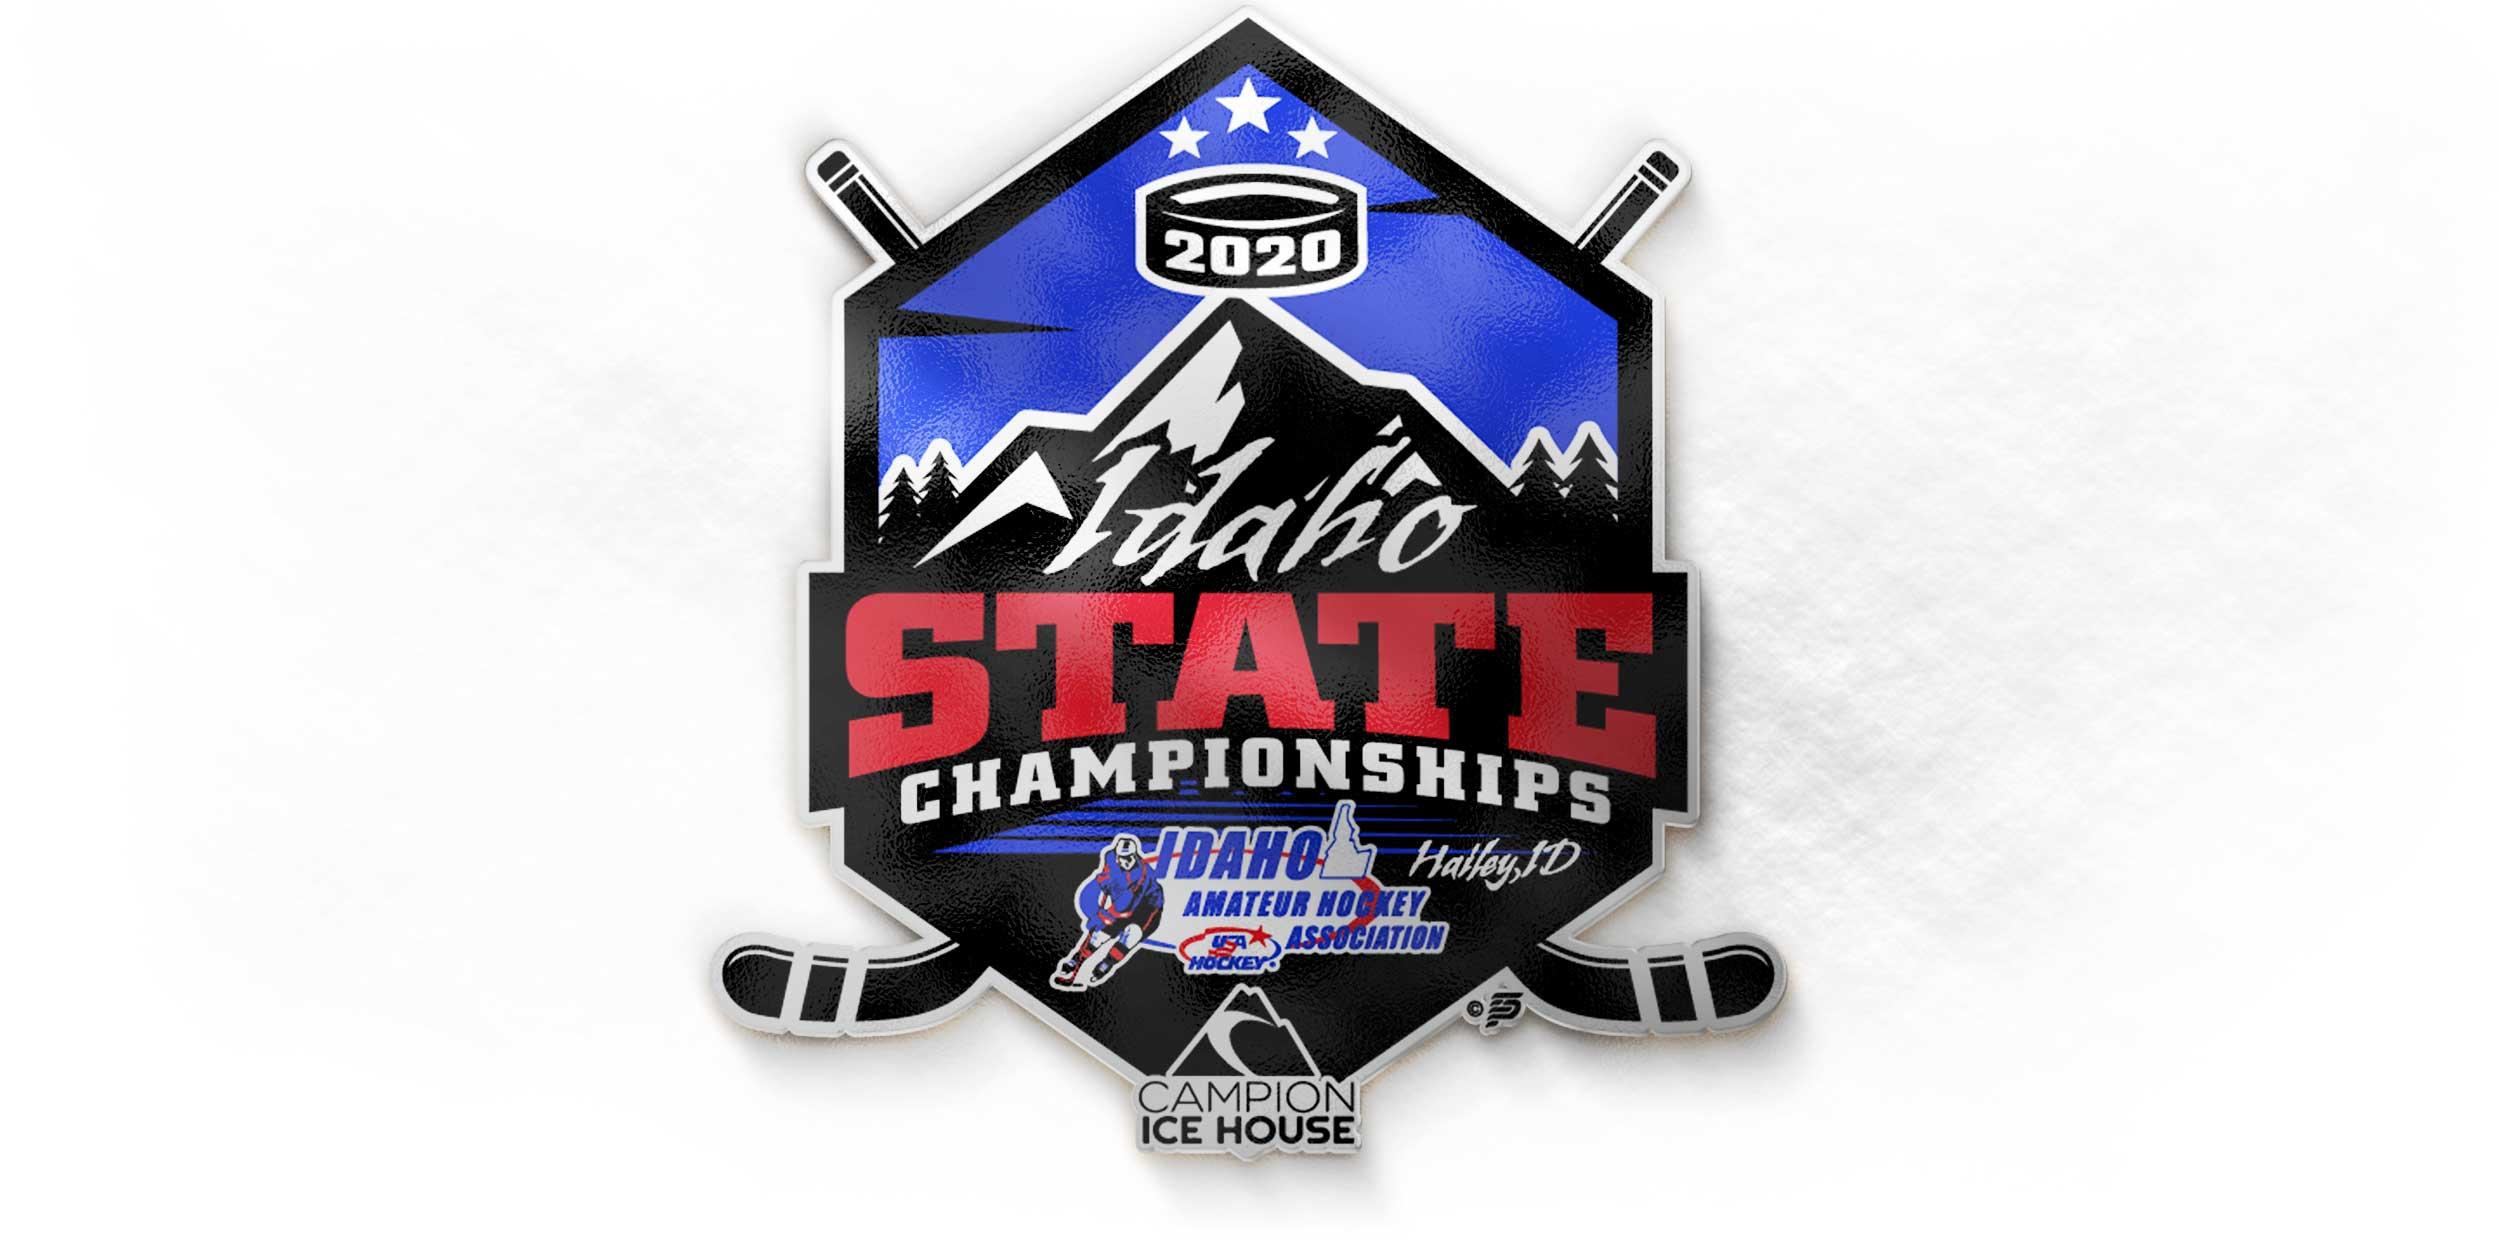 Idaho-State-Championships-Hockey-Fine-Designs-Apparel